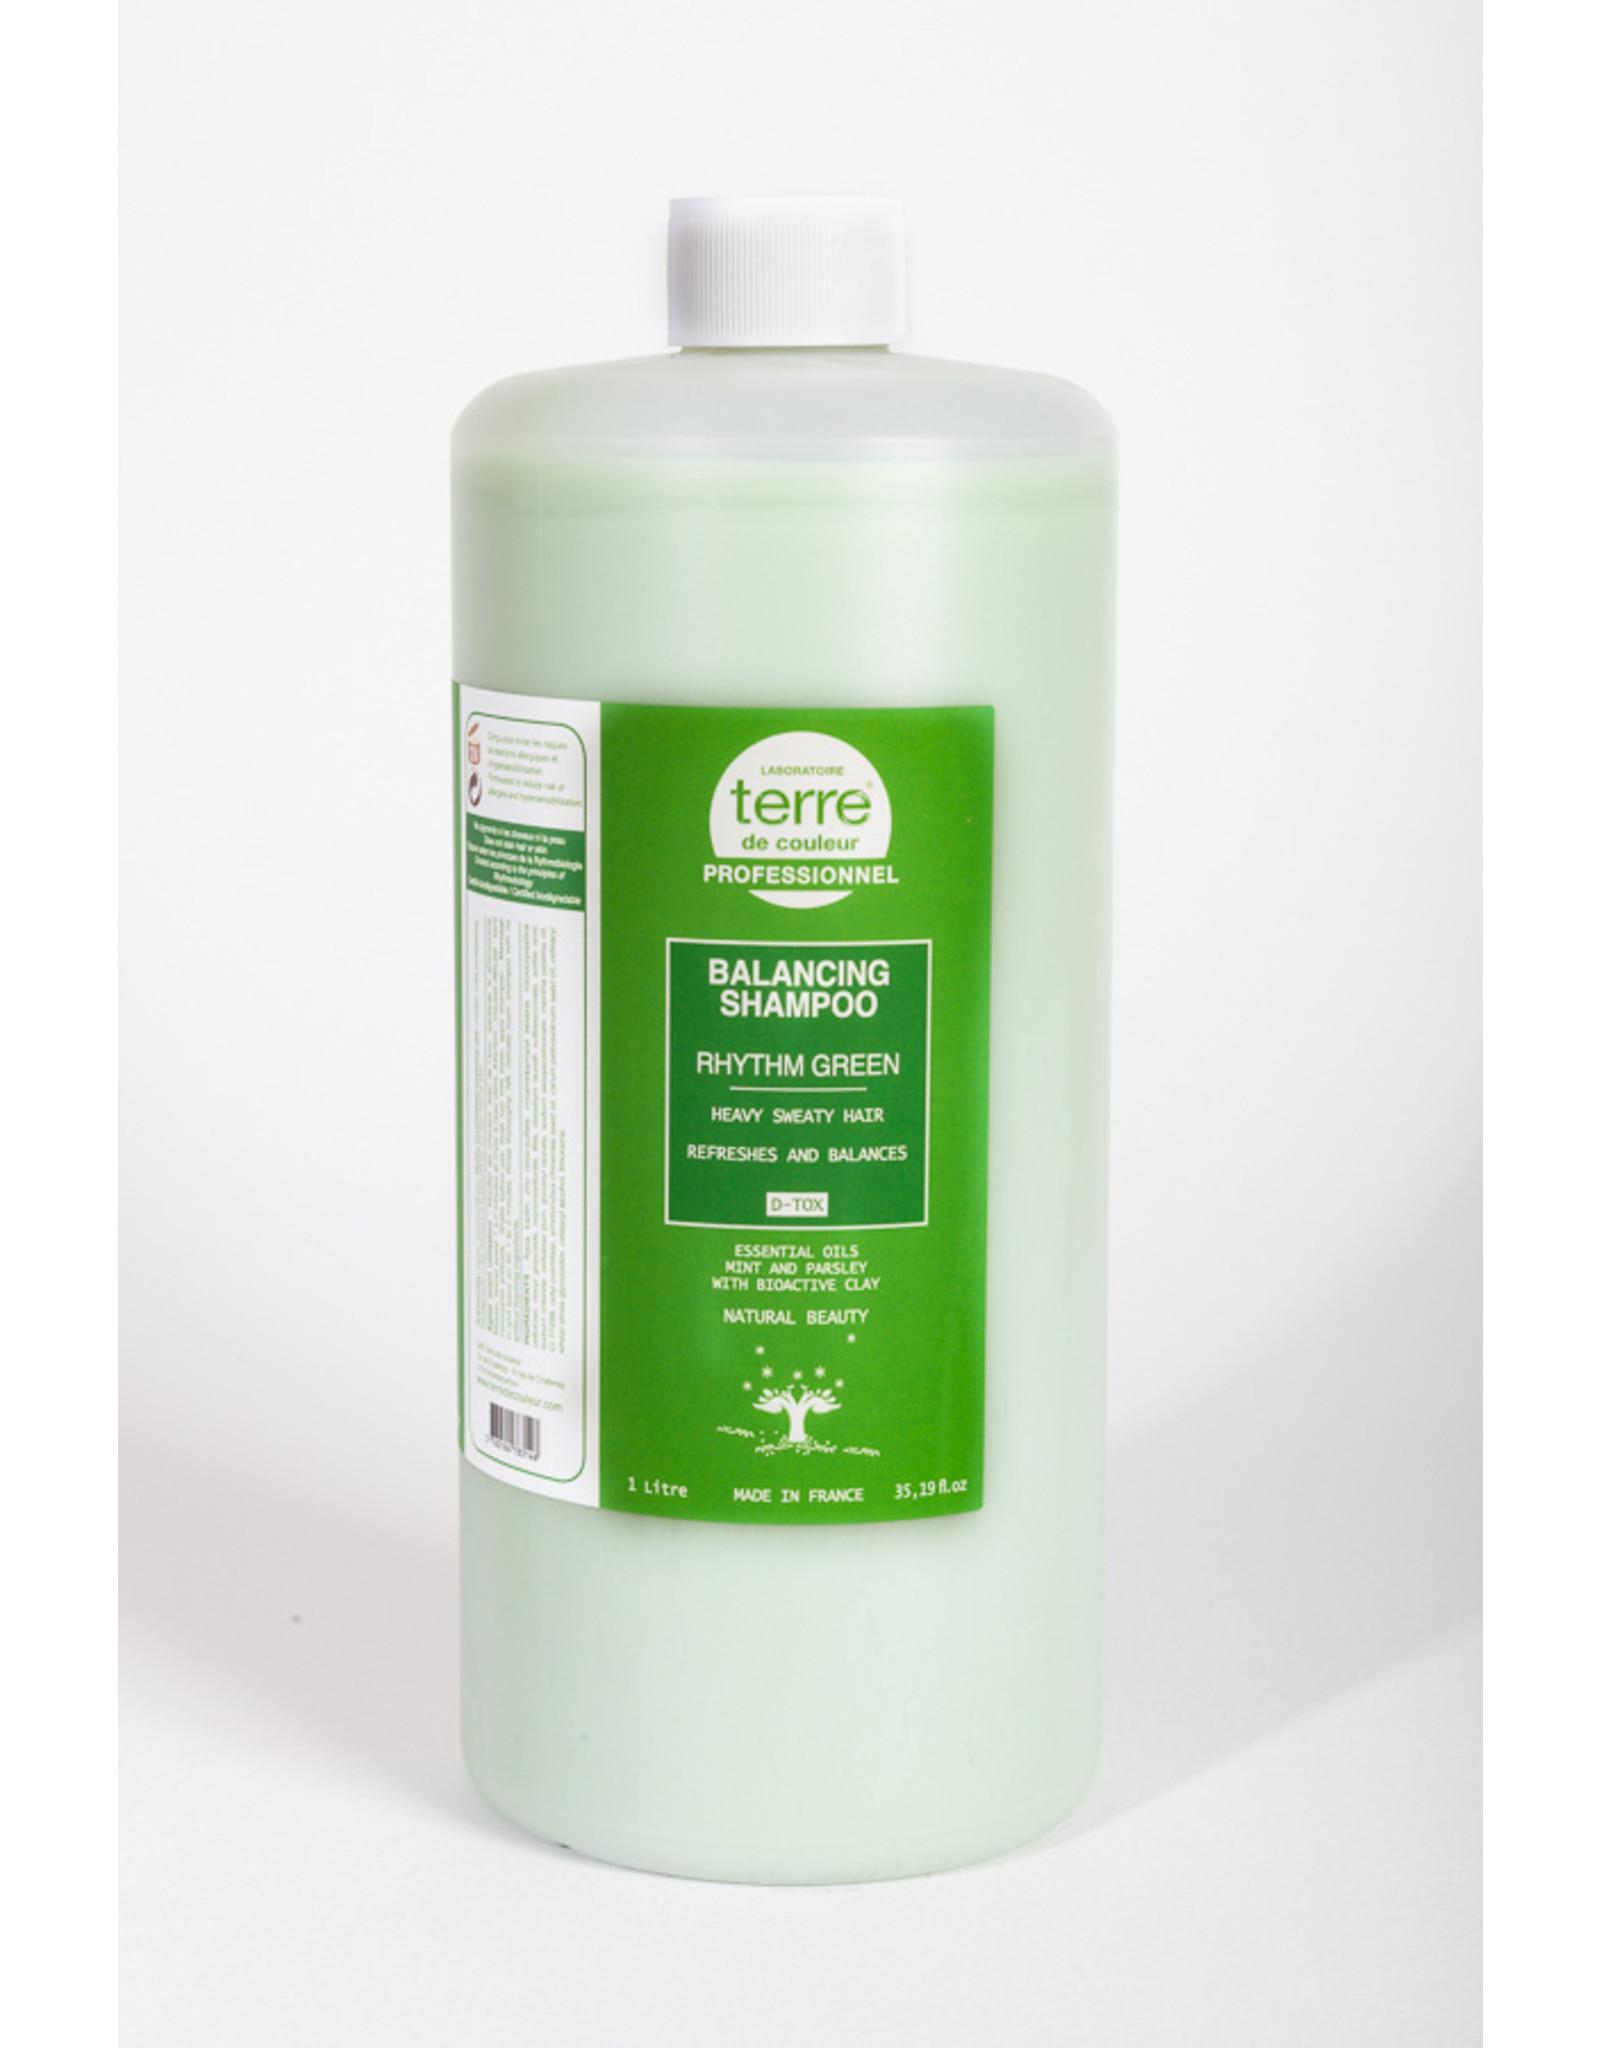 Terre de Couleur Rythme Groen Shampoo